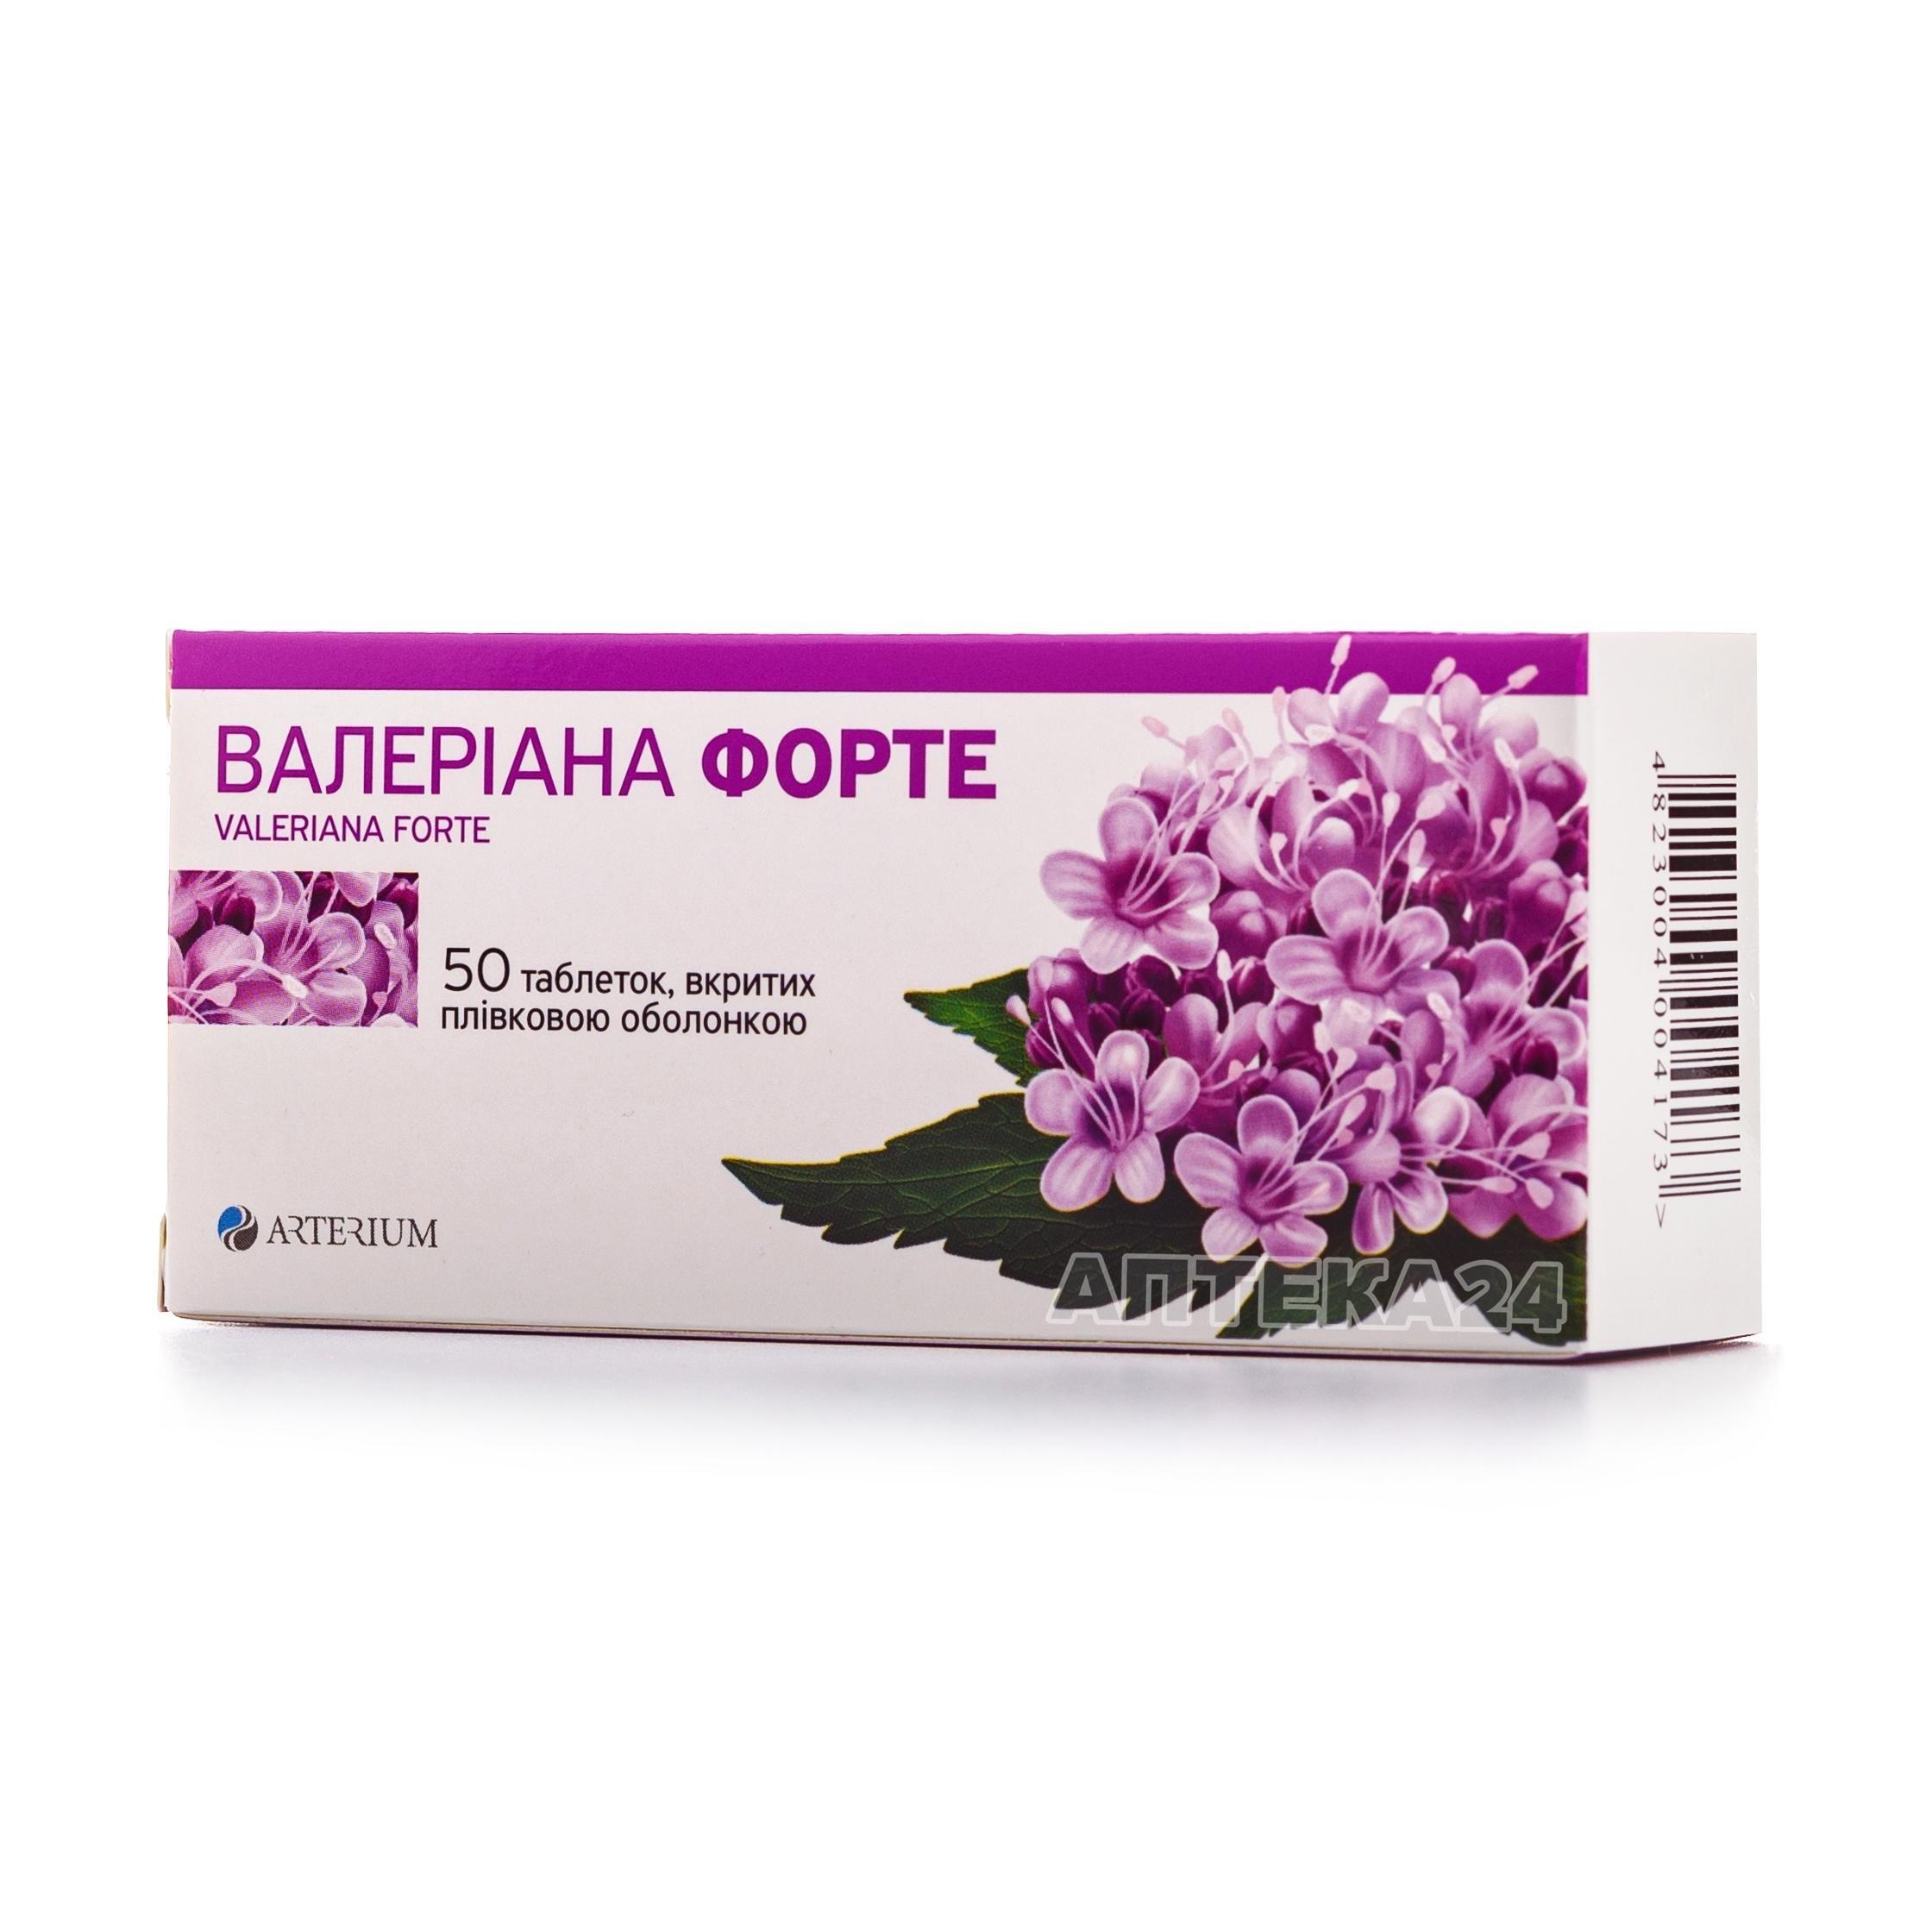 Валерианы форте 40 мг №50 таблетки_6005dcd2b7ce9.jpeg